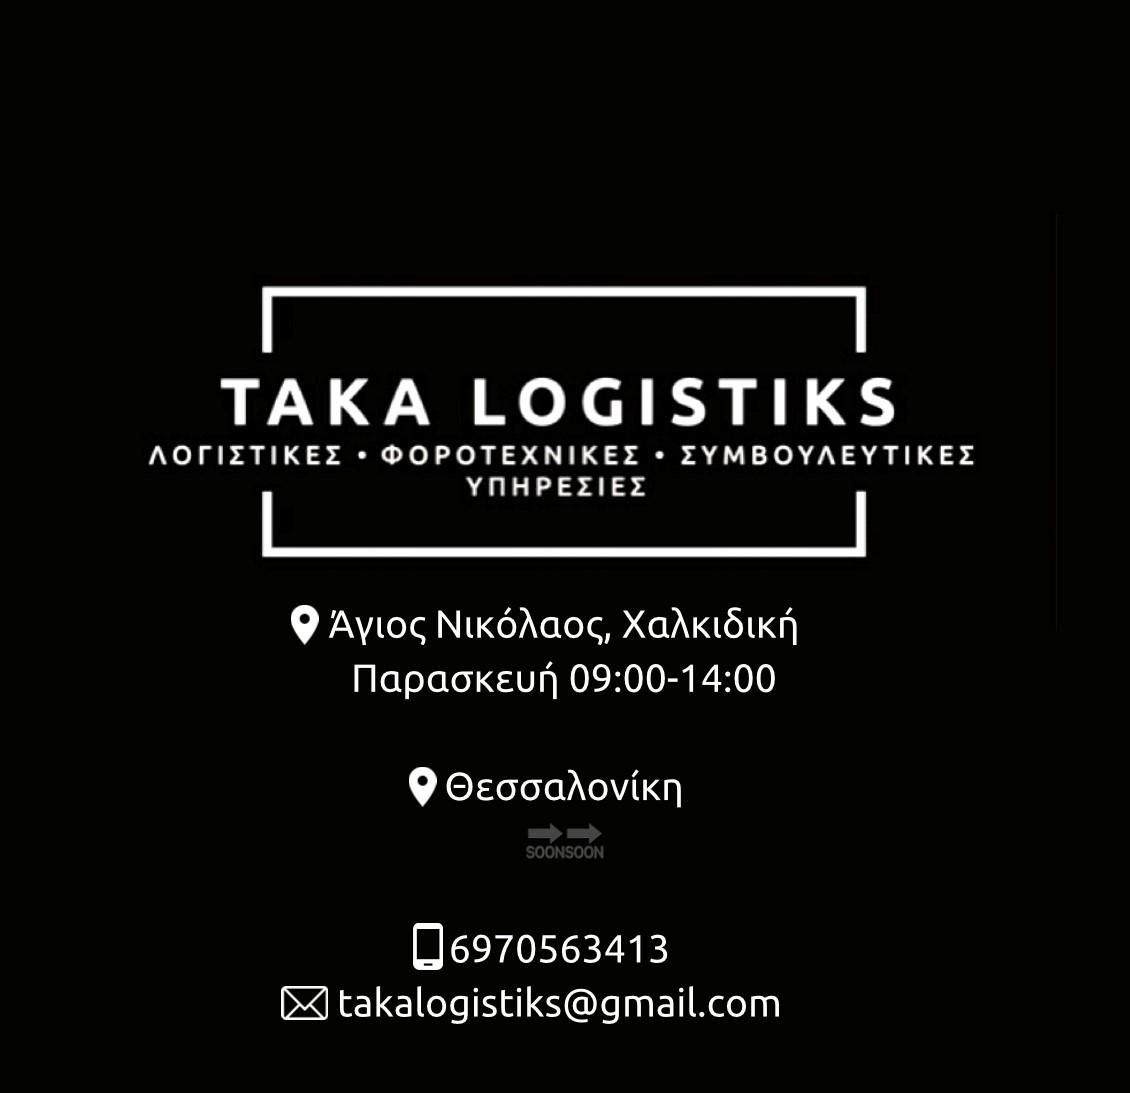 TAKA LOGISTIKS | TAKA ANNA